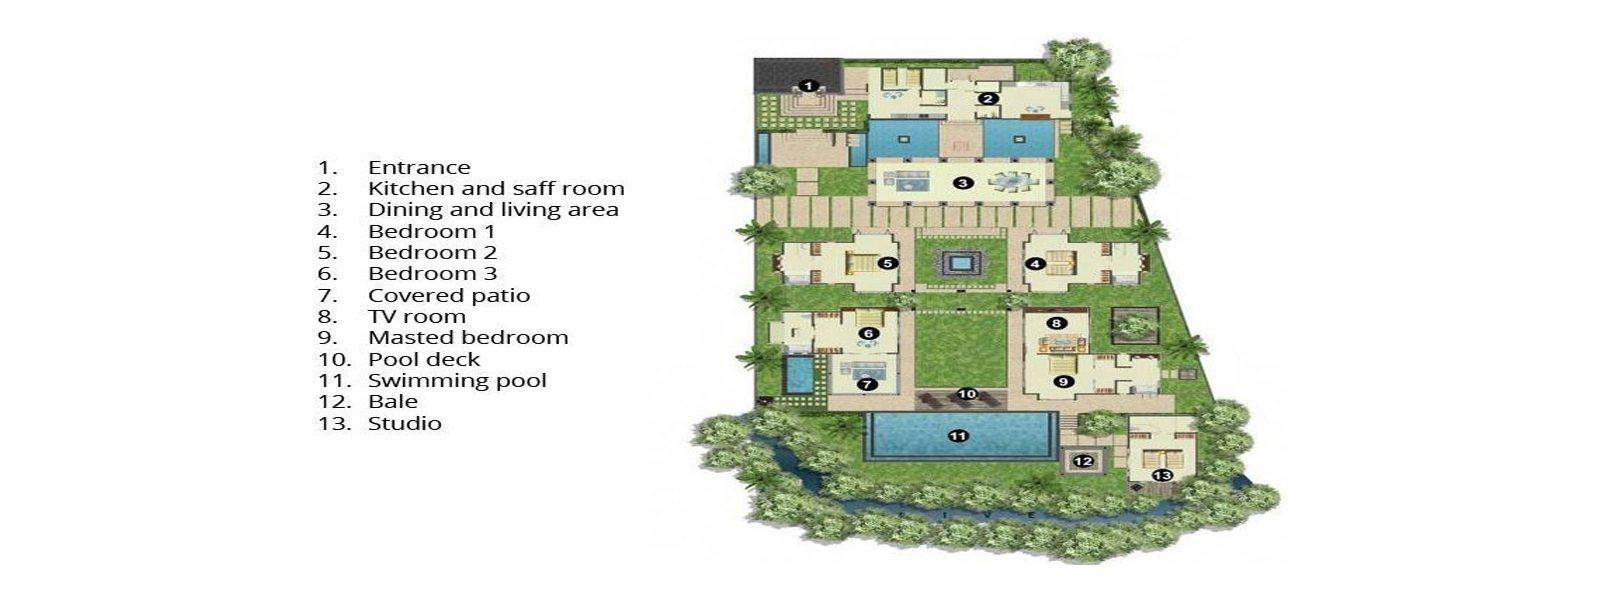 Villa Mata Air Floorplan | Canggu, Bali